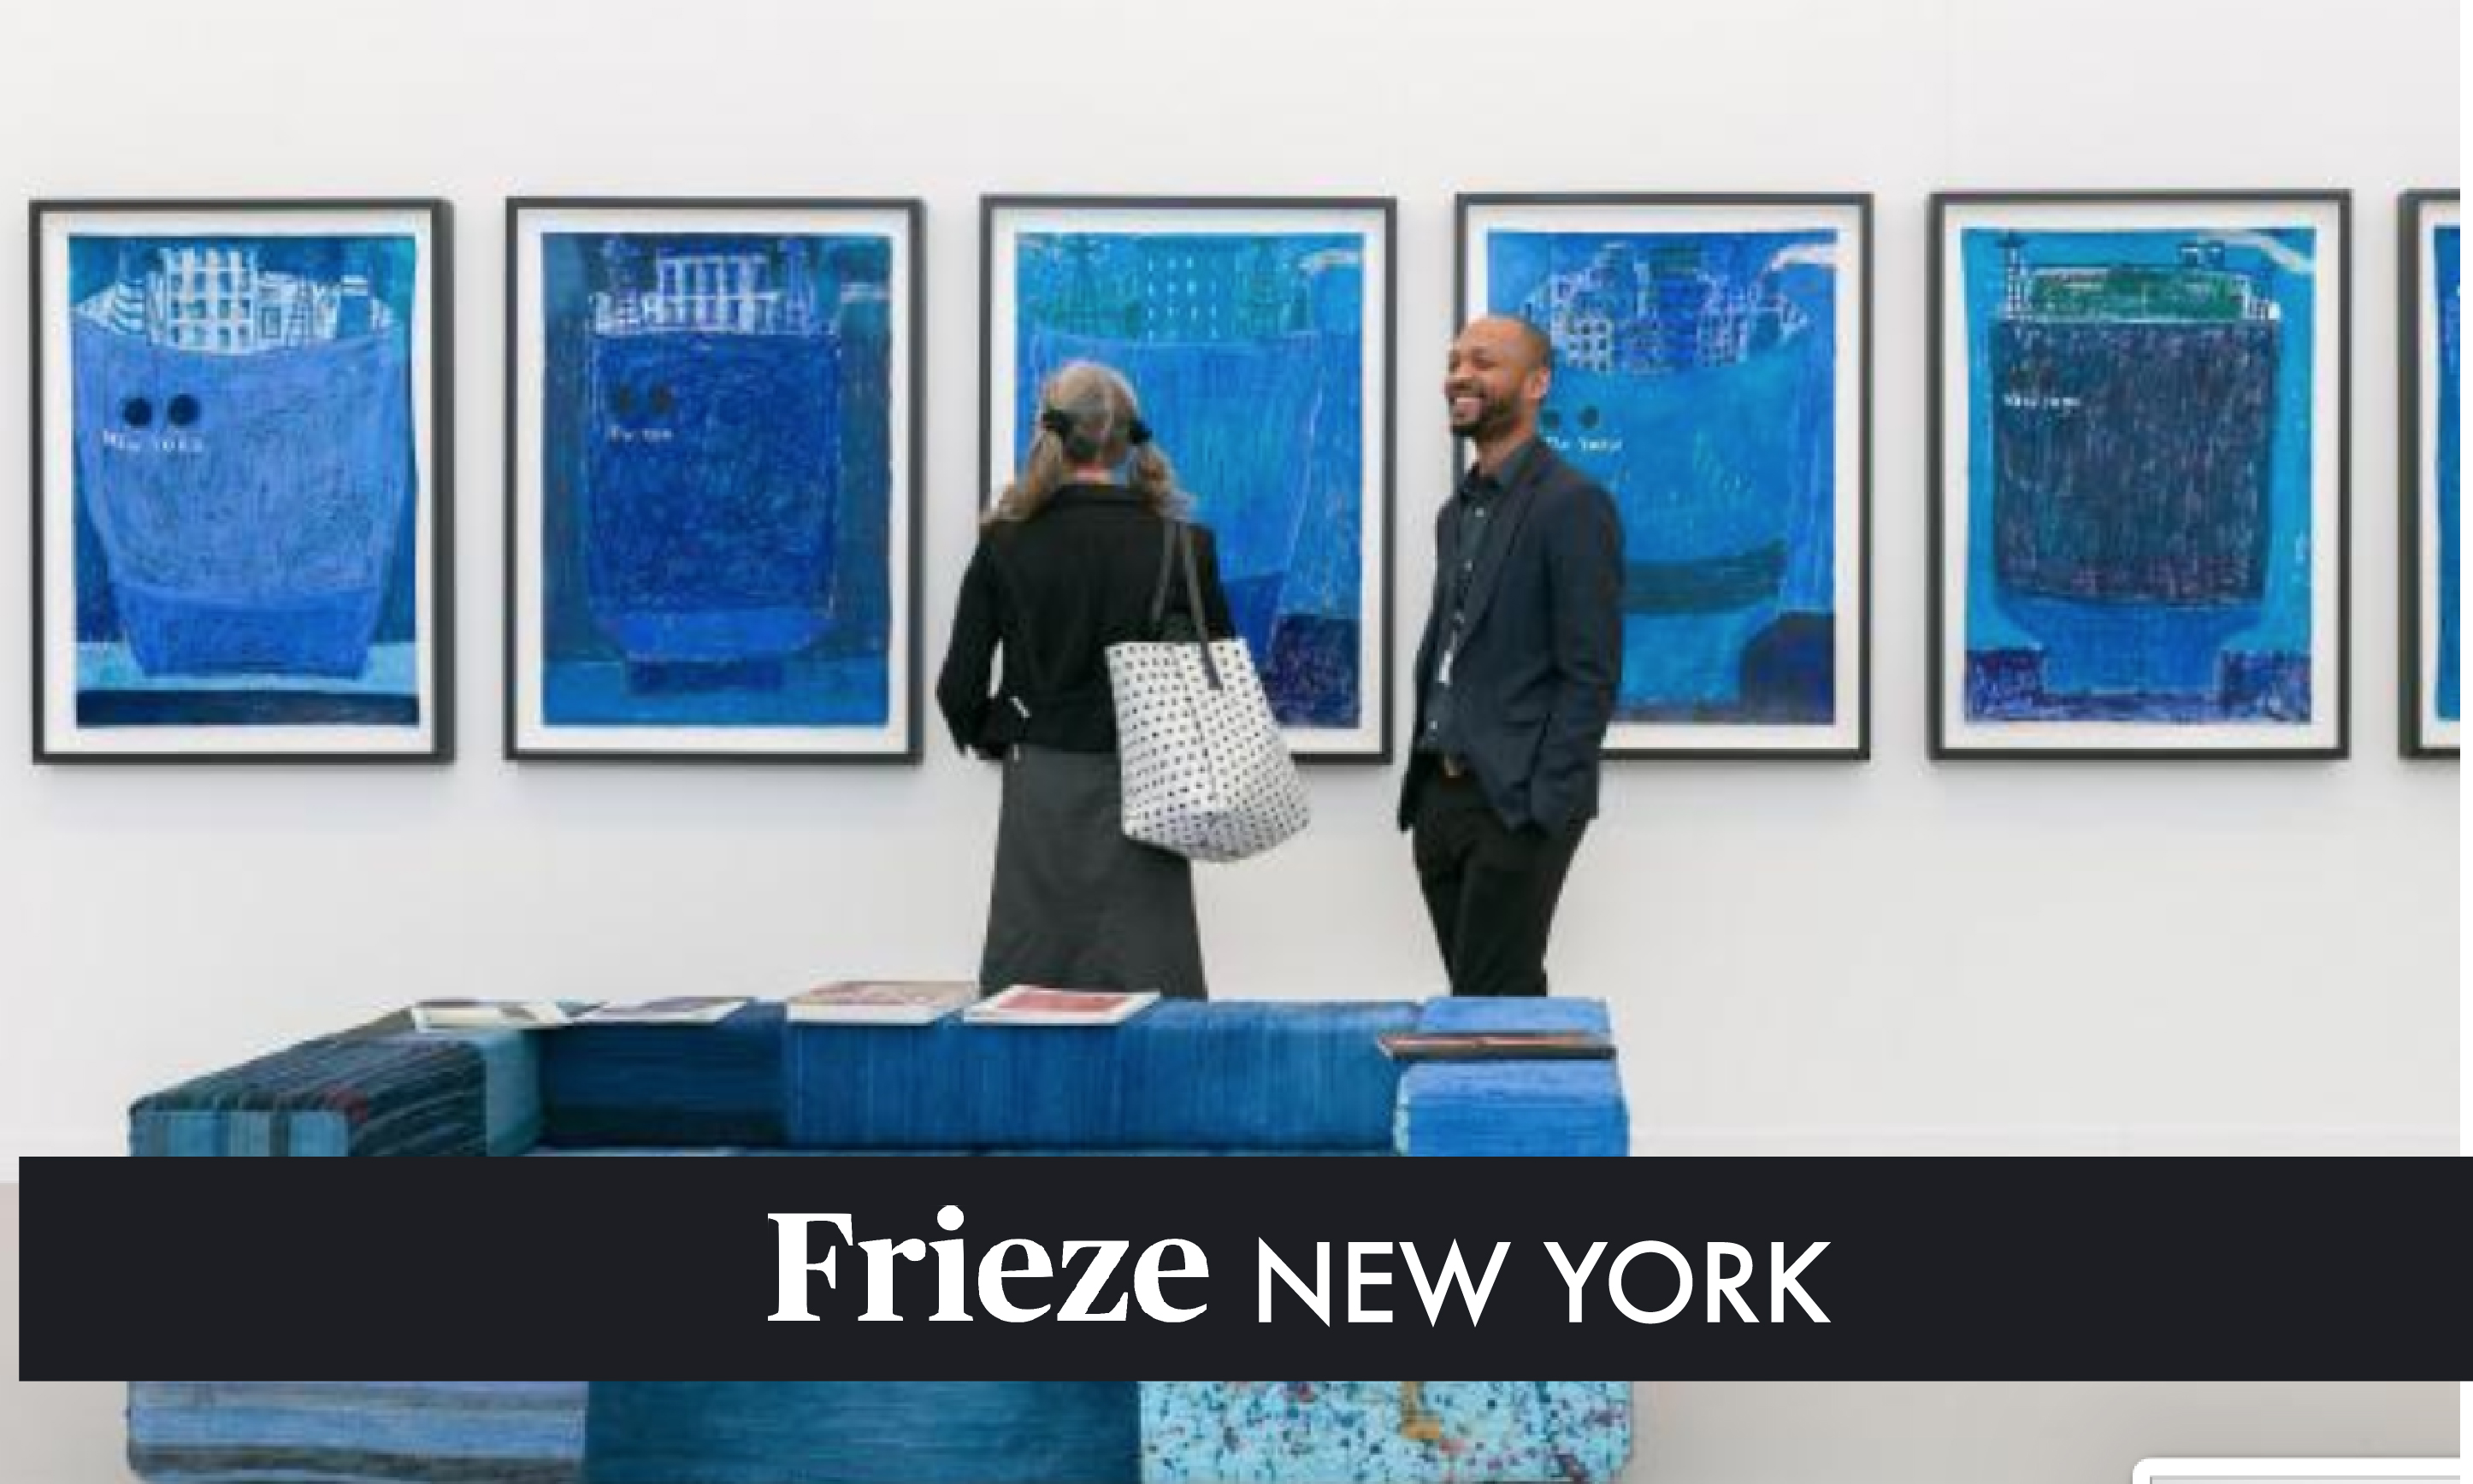 man and woman looking at blue paintings at frieze 2019 art fair